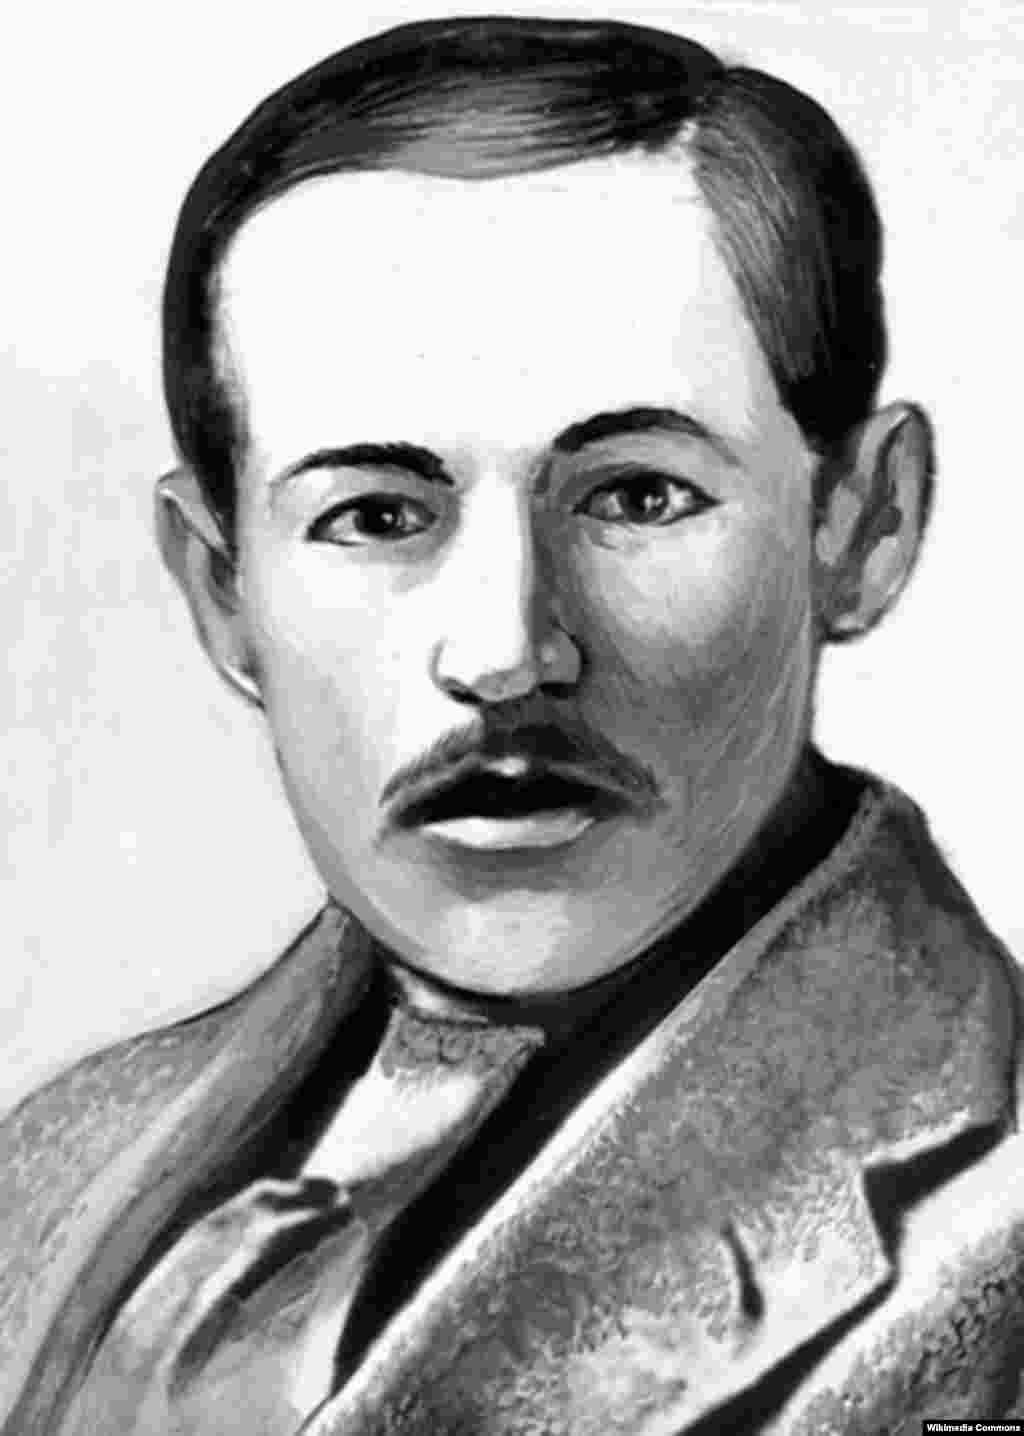 Андрей Эшкинин